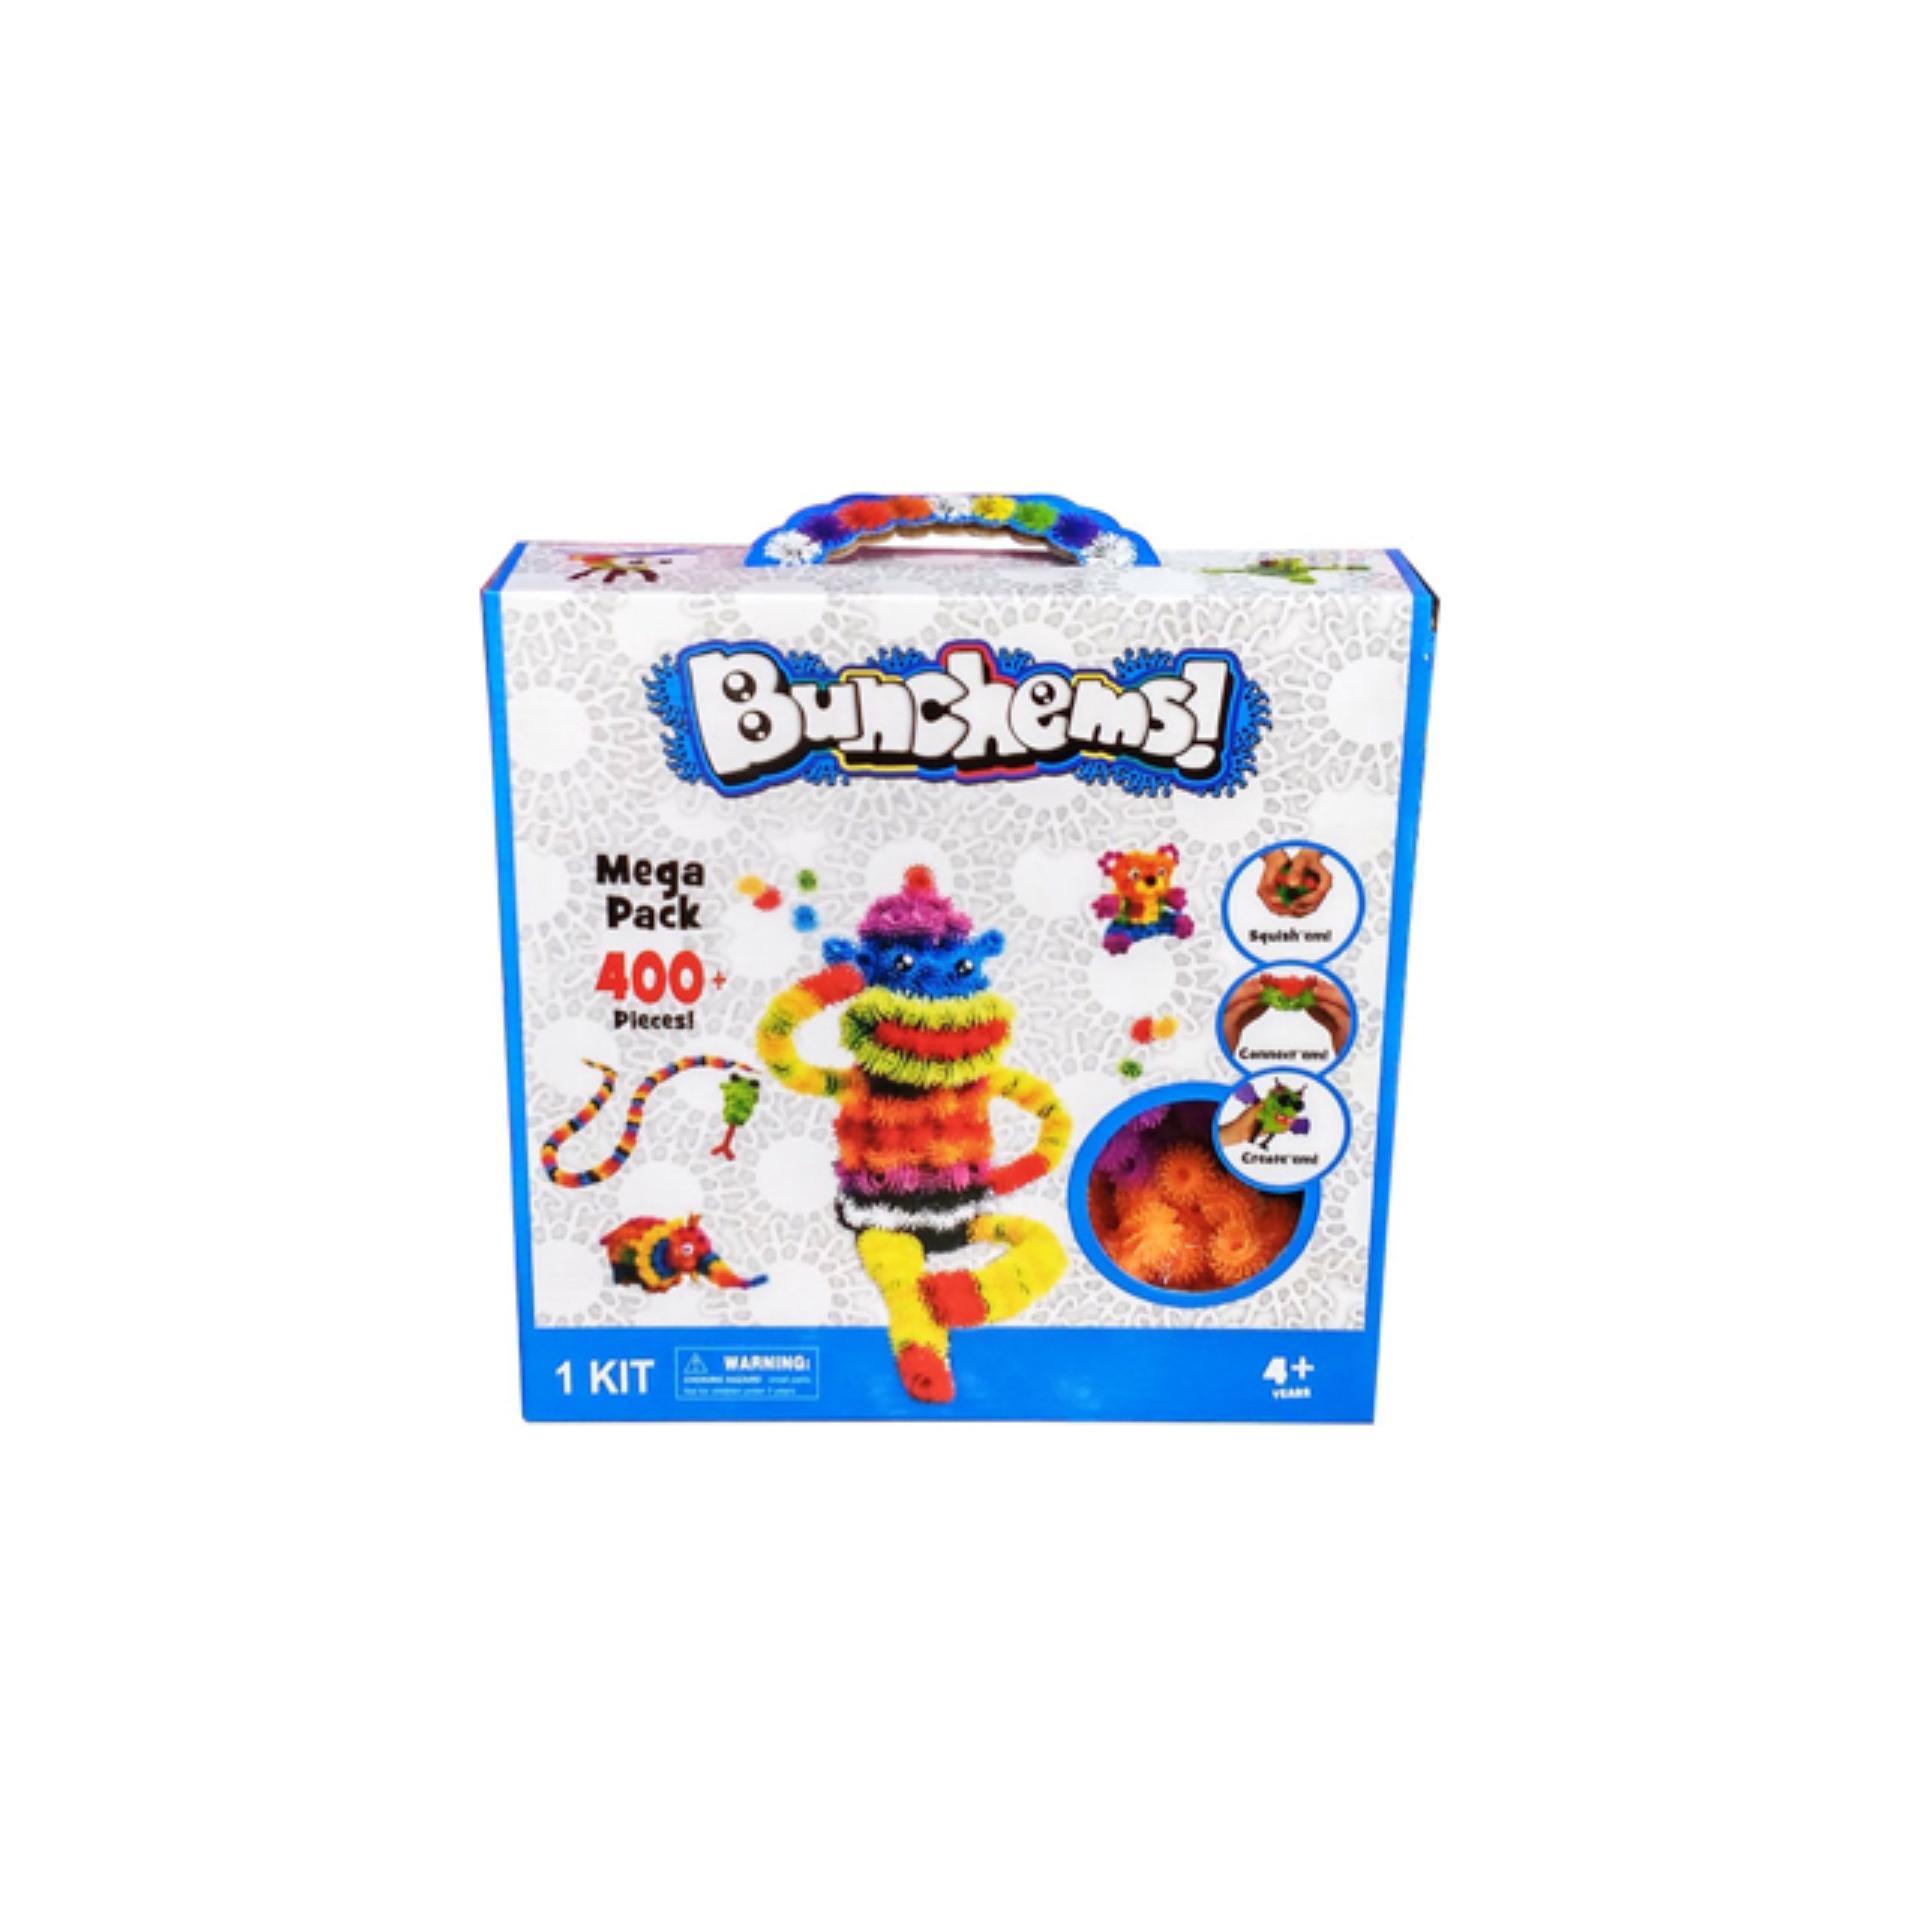 Belanja Murah Mainan Anak Bunchems Magical Magic Ball Eshop Mega Pack Edukasi